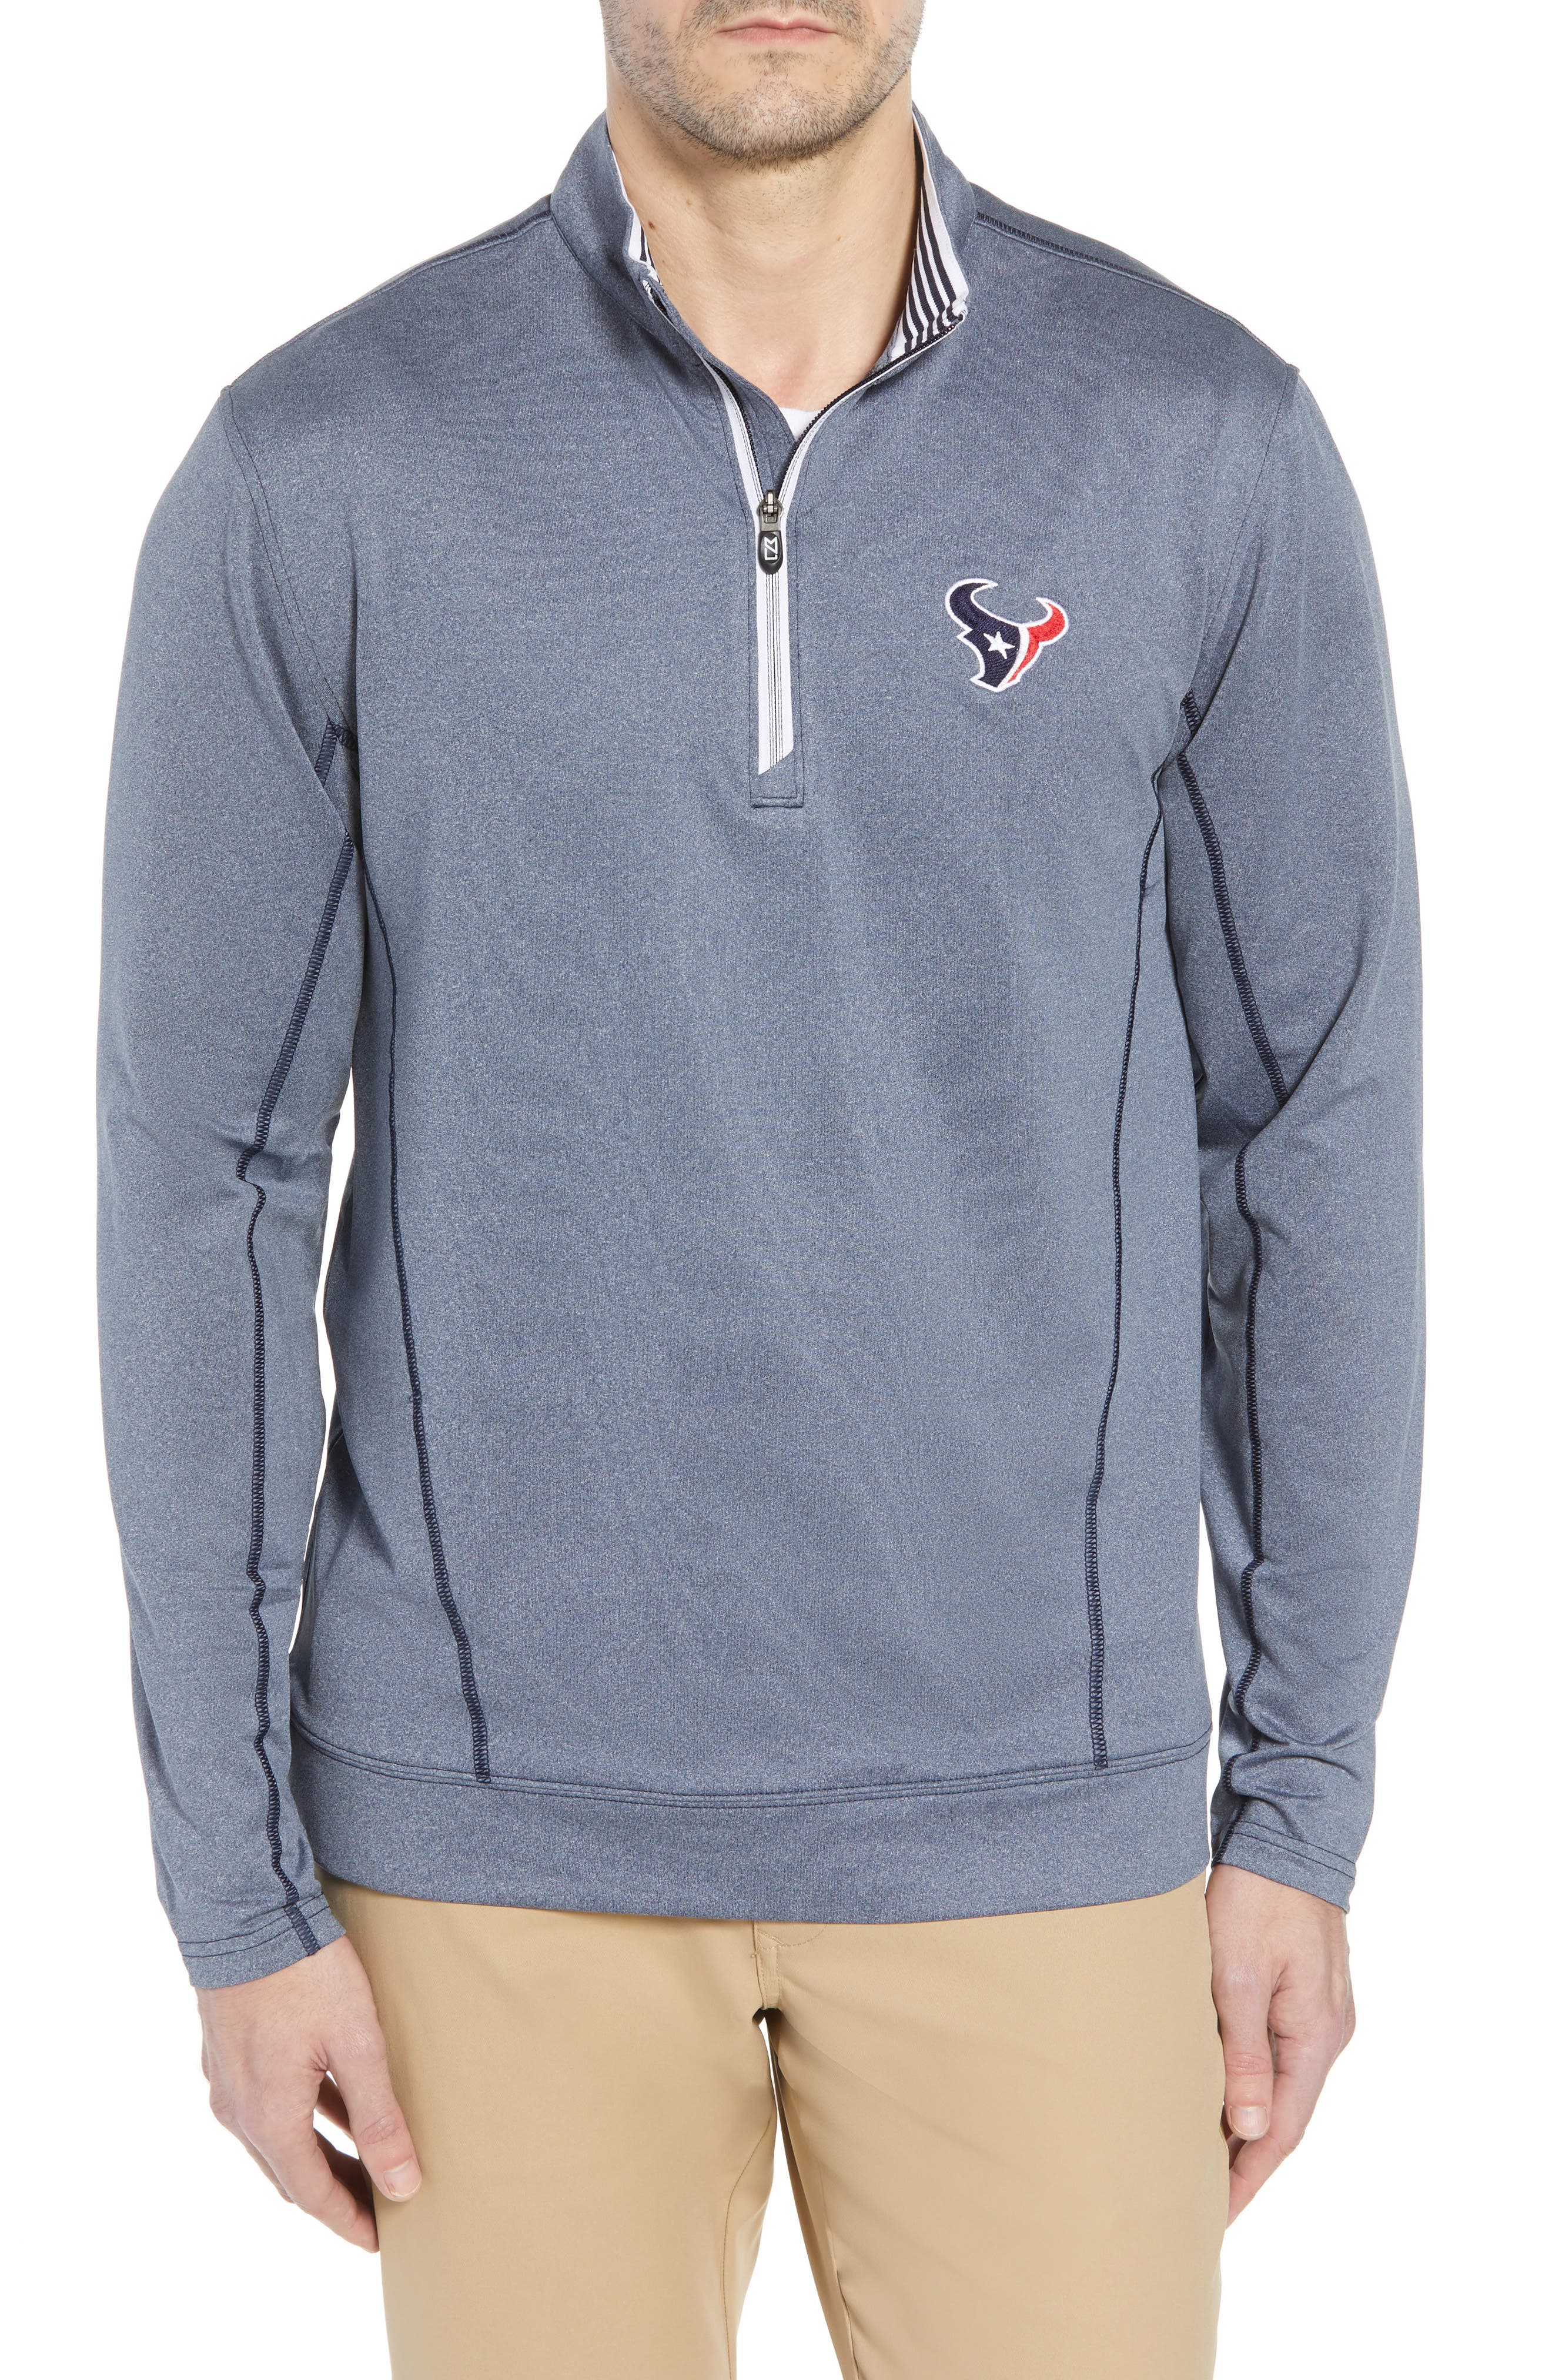 Endurance Houston Texans Regular Fit Pullover,                             Main thumbnail 1, color,                             LIBERTY NAVY HEATHER